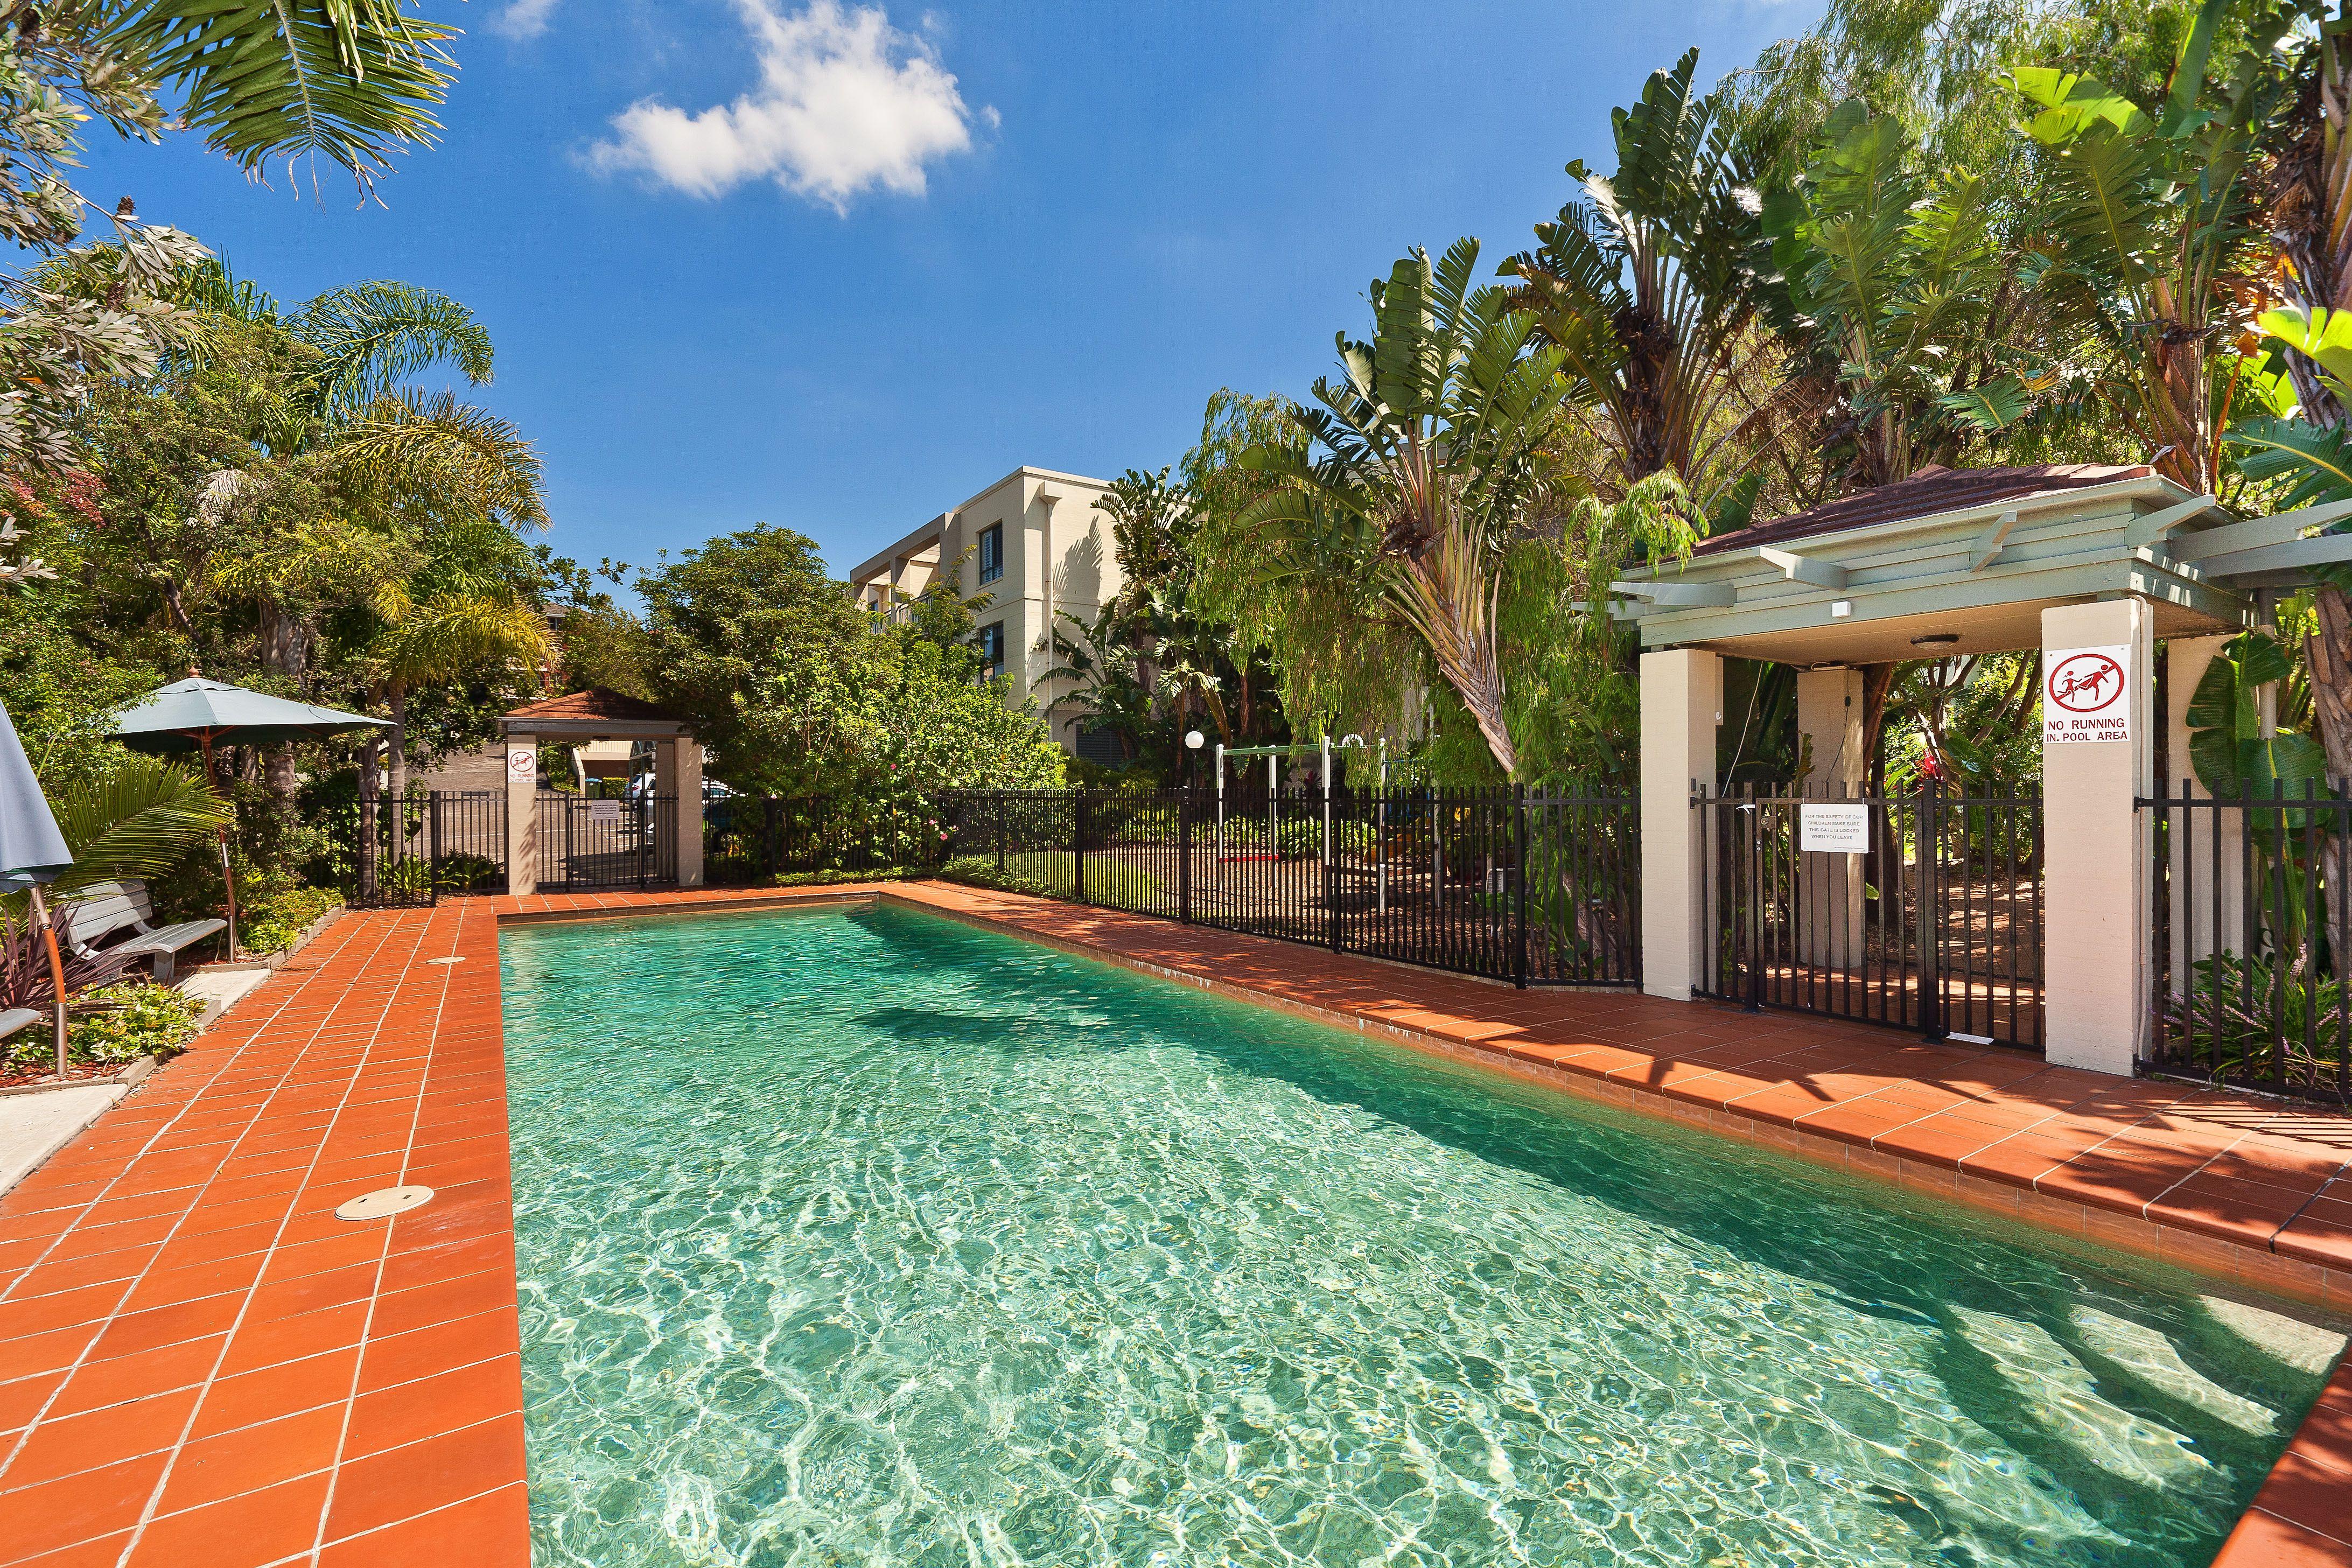 2/425 Malabar Road, Maroubra NSW 2035